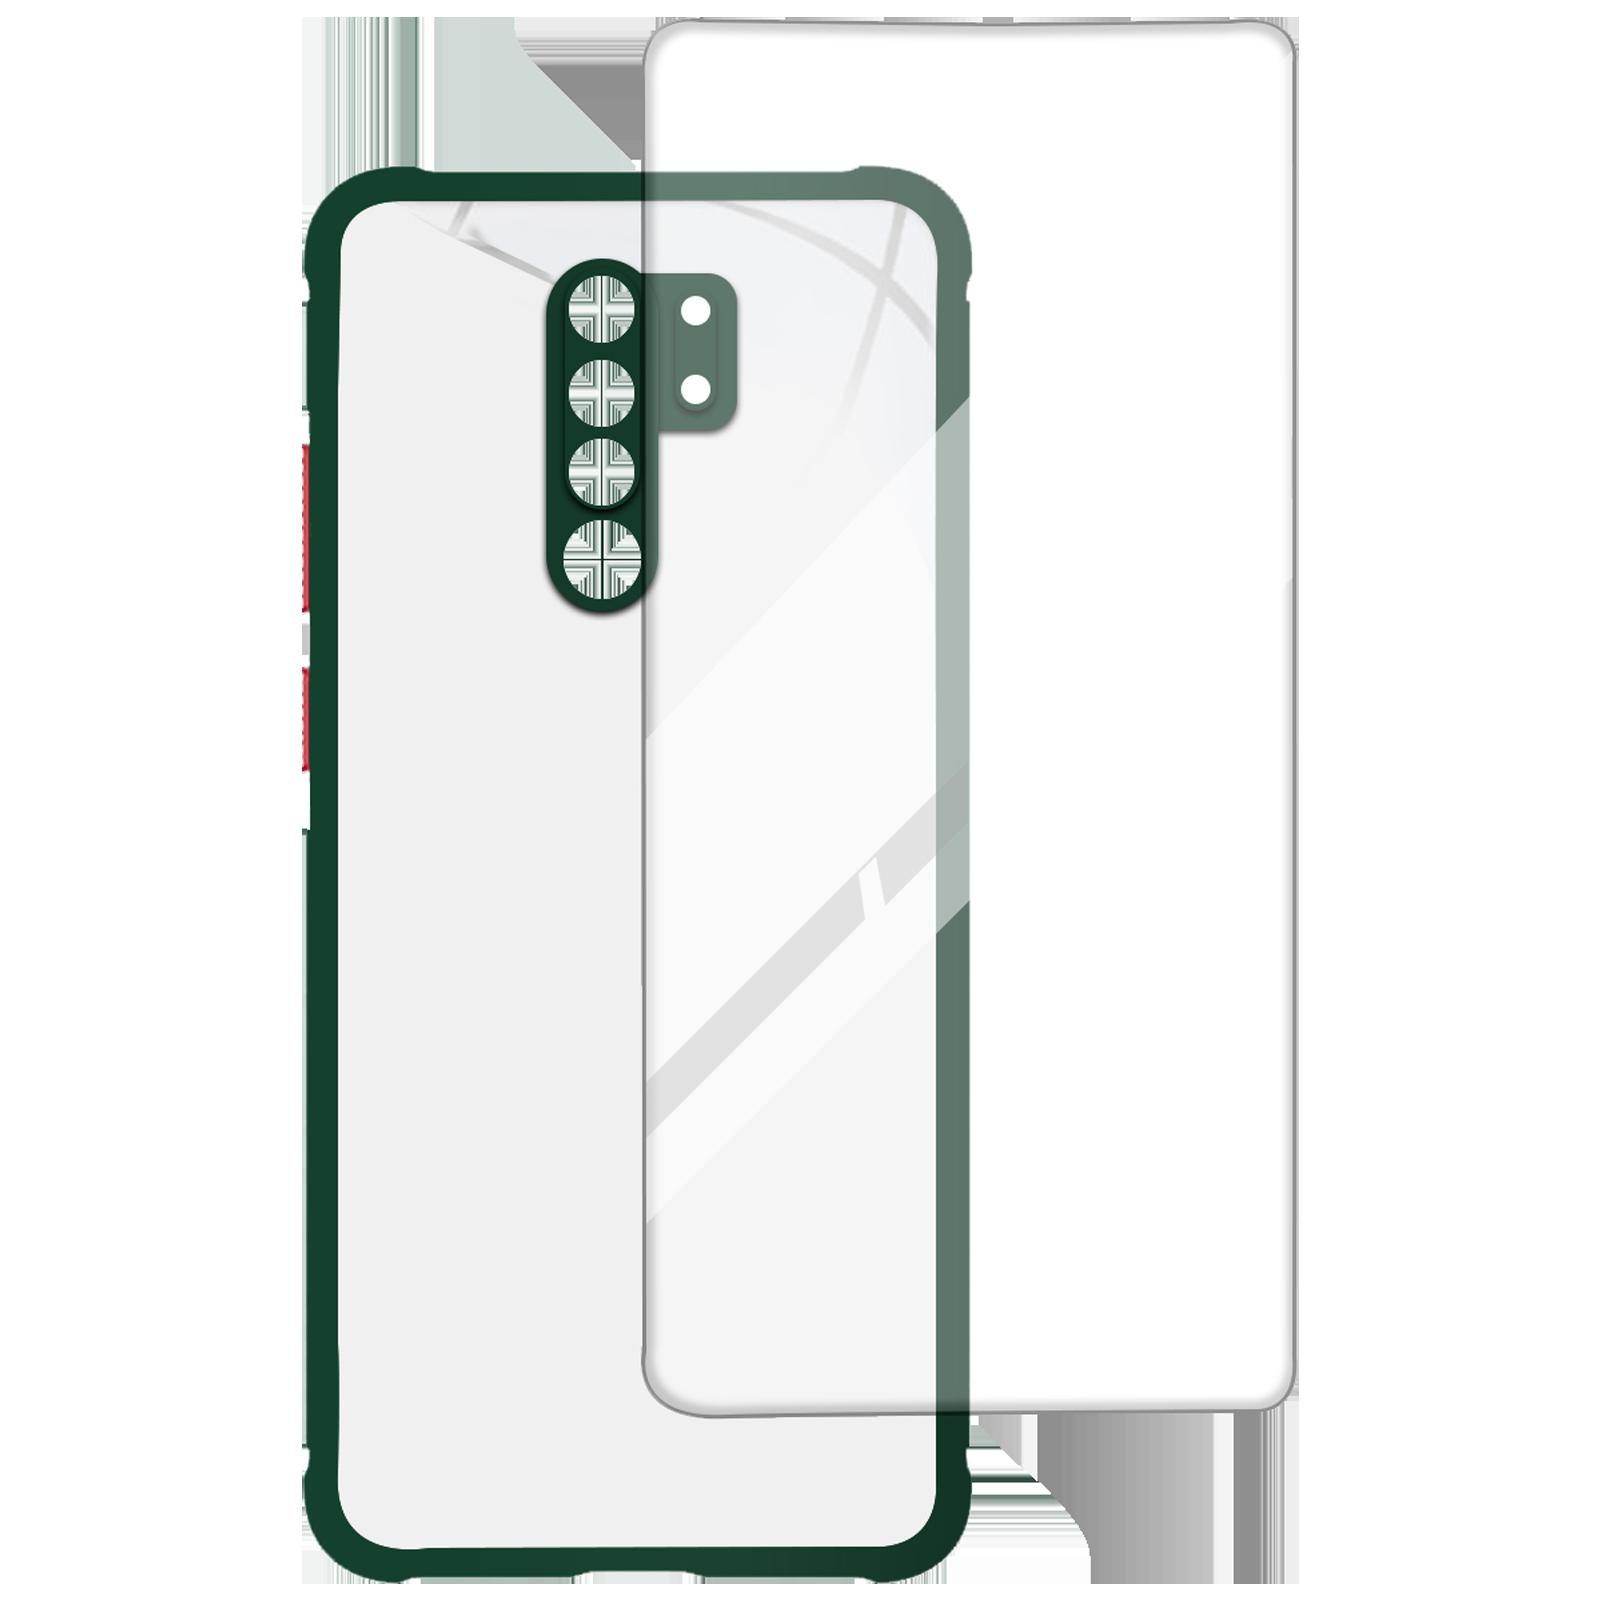 Arrow Hybrid Back Case and Screen Protector Bundle For Redmi 9 Prime (Ultra Transparent Visibility, AR-1021, Dark Green)_1